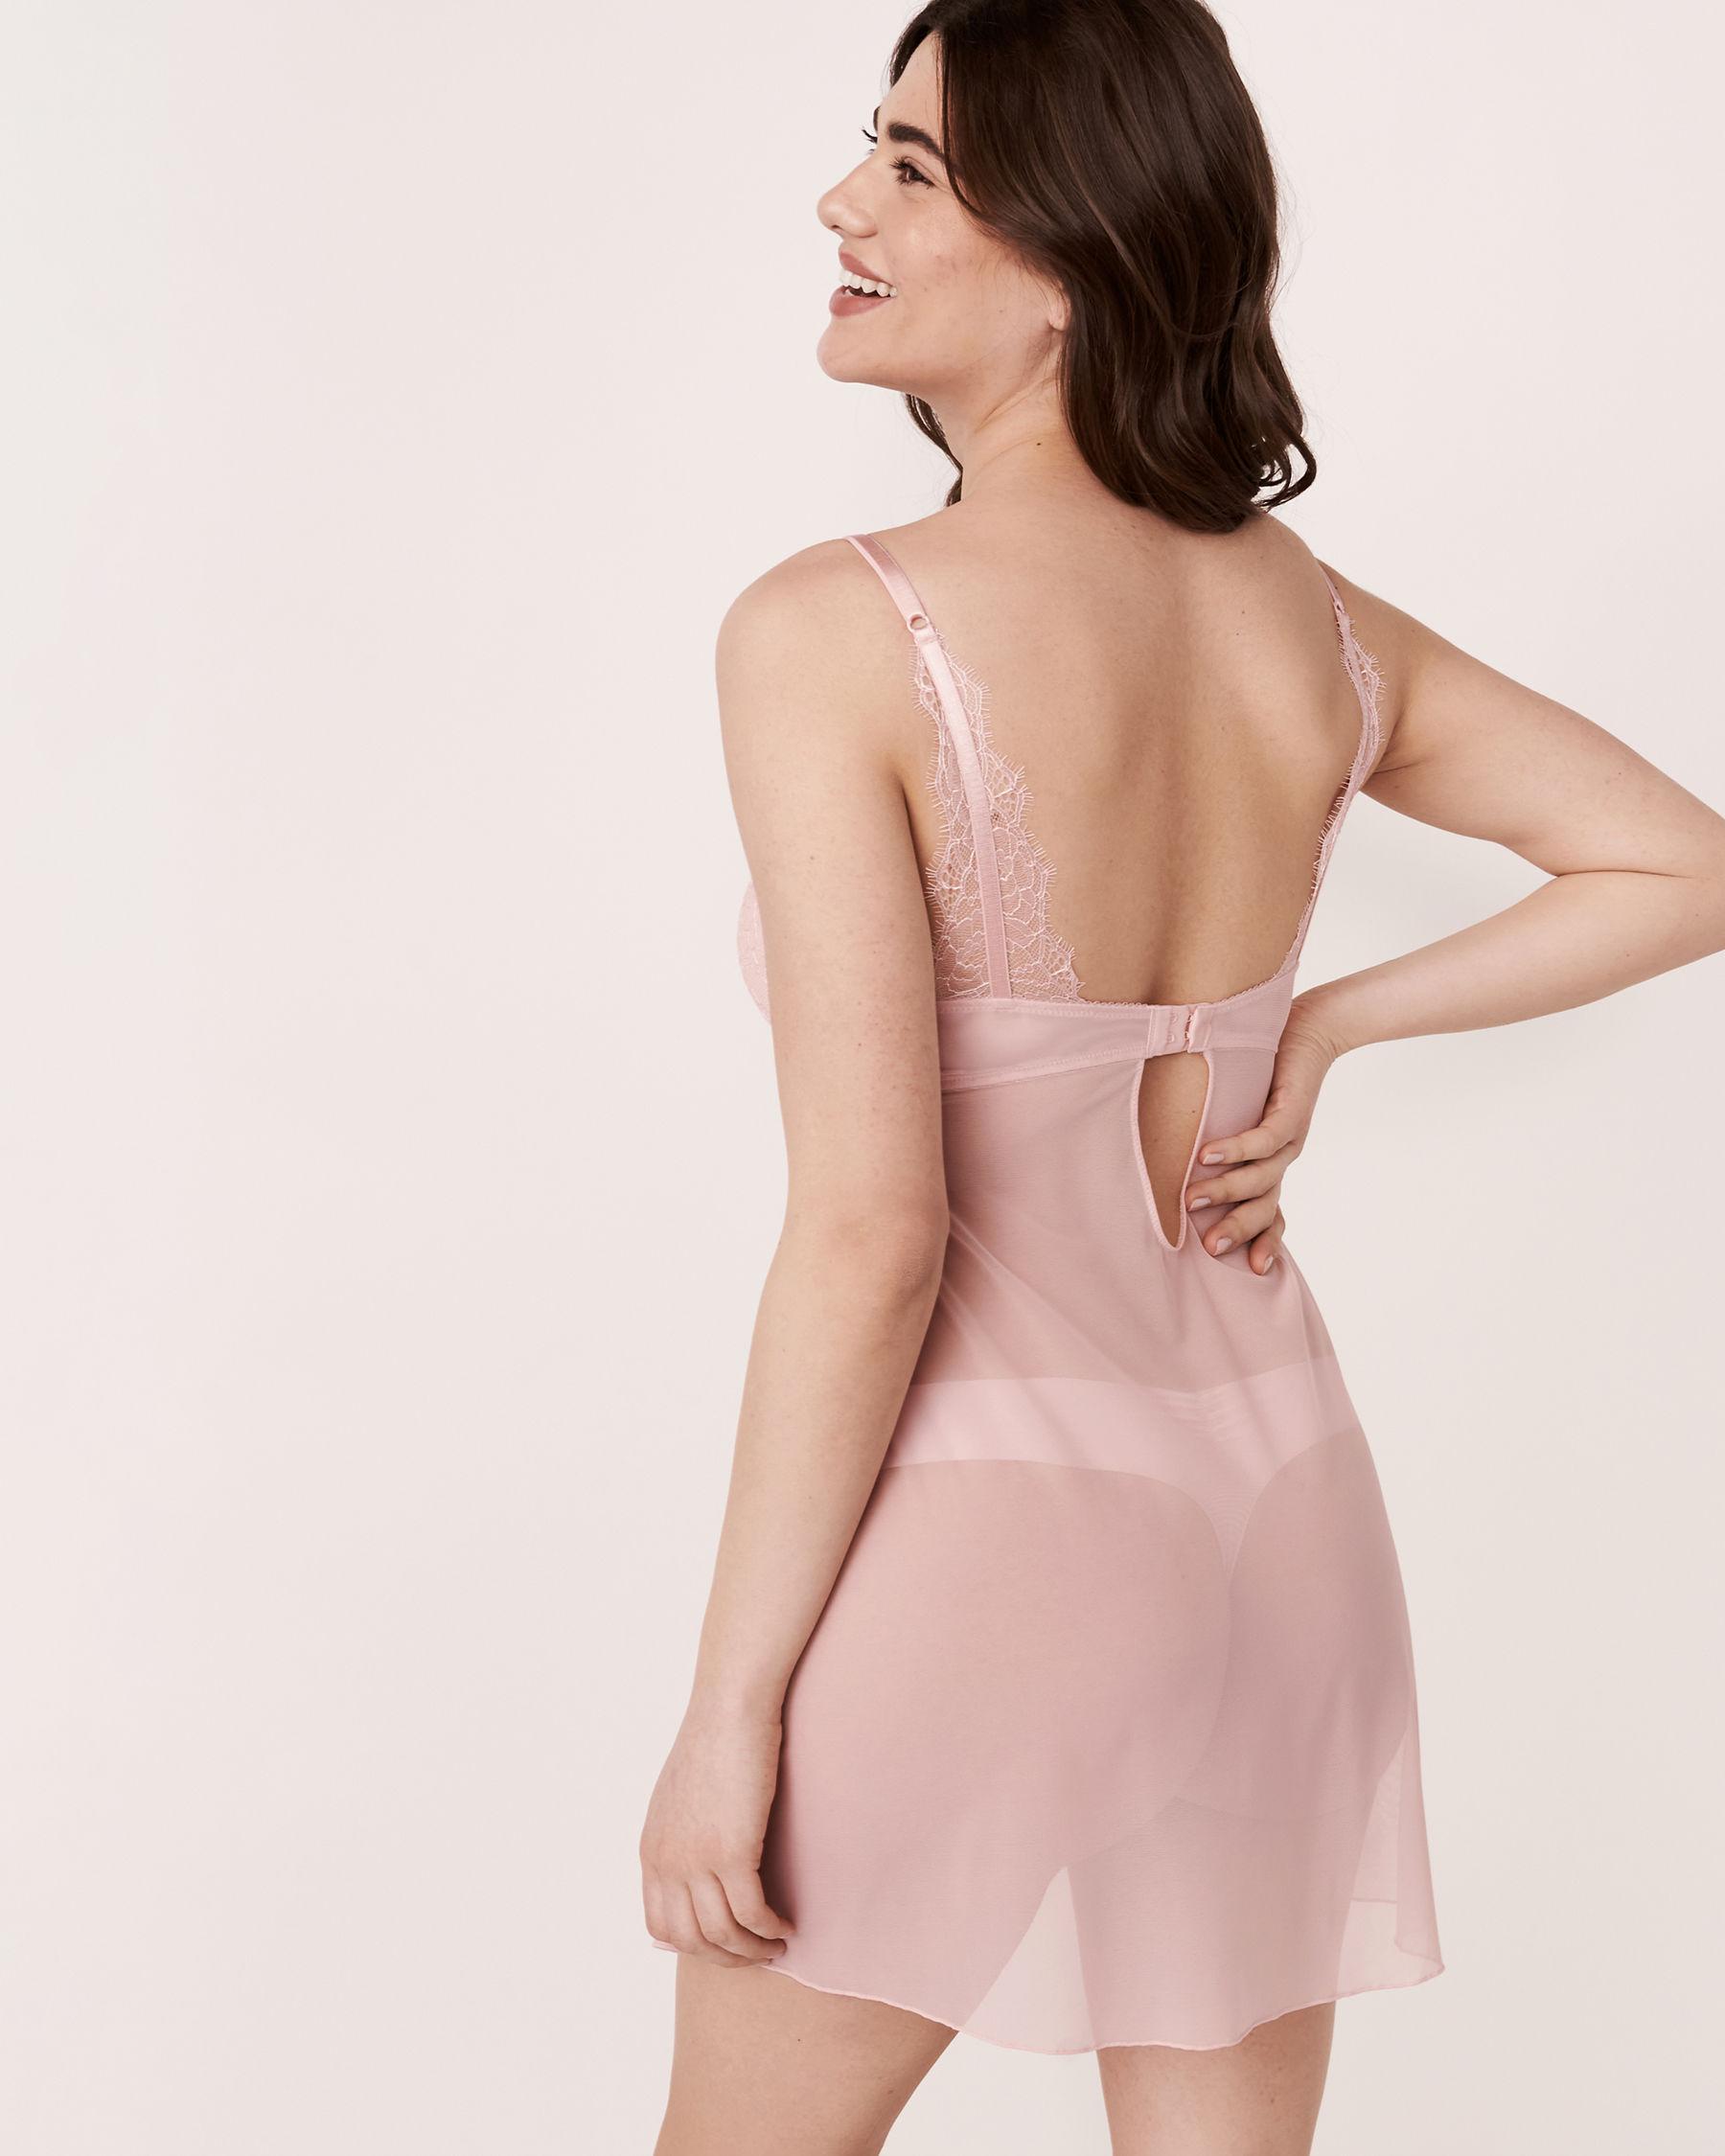 LA VIE EN ROSE Lace and Mesh Draped Babydoll Light pink 60500011 - View2